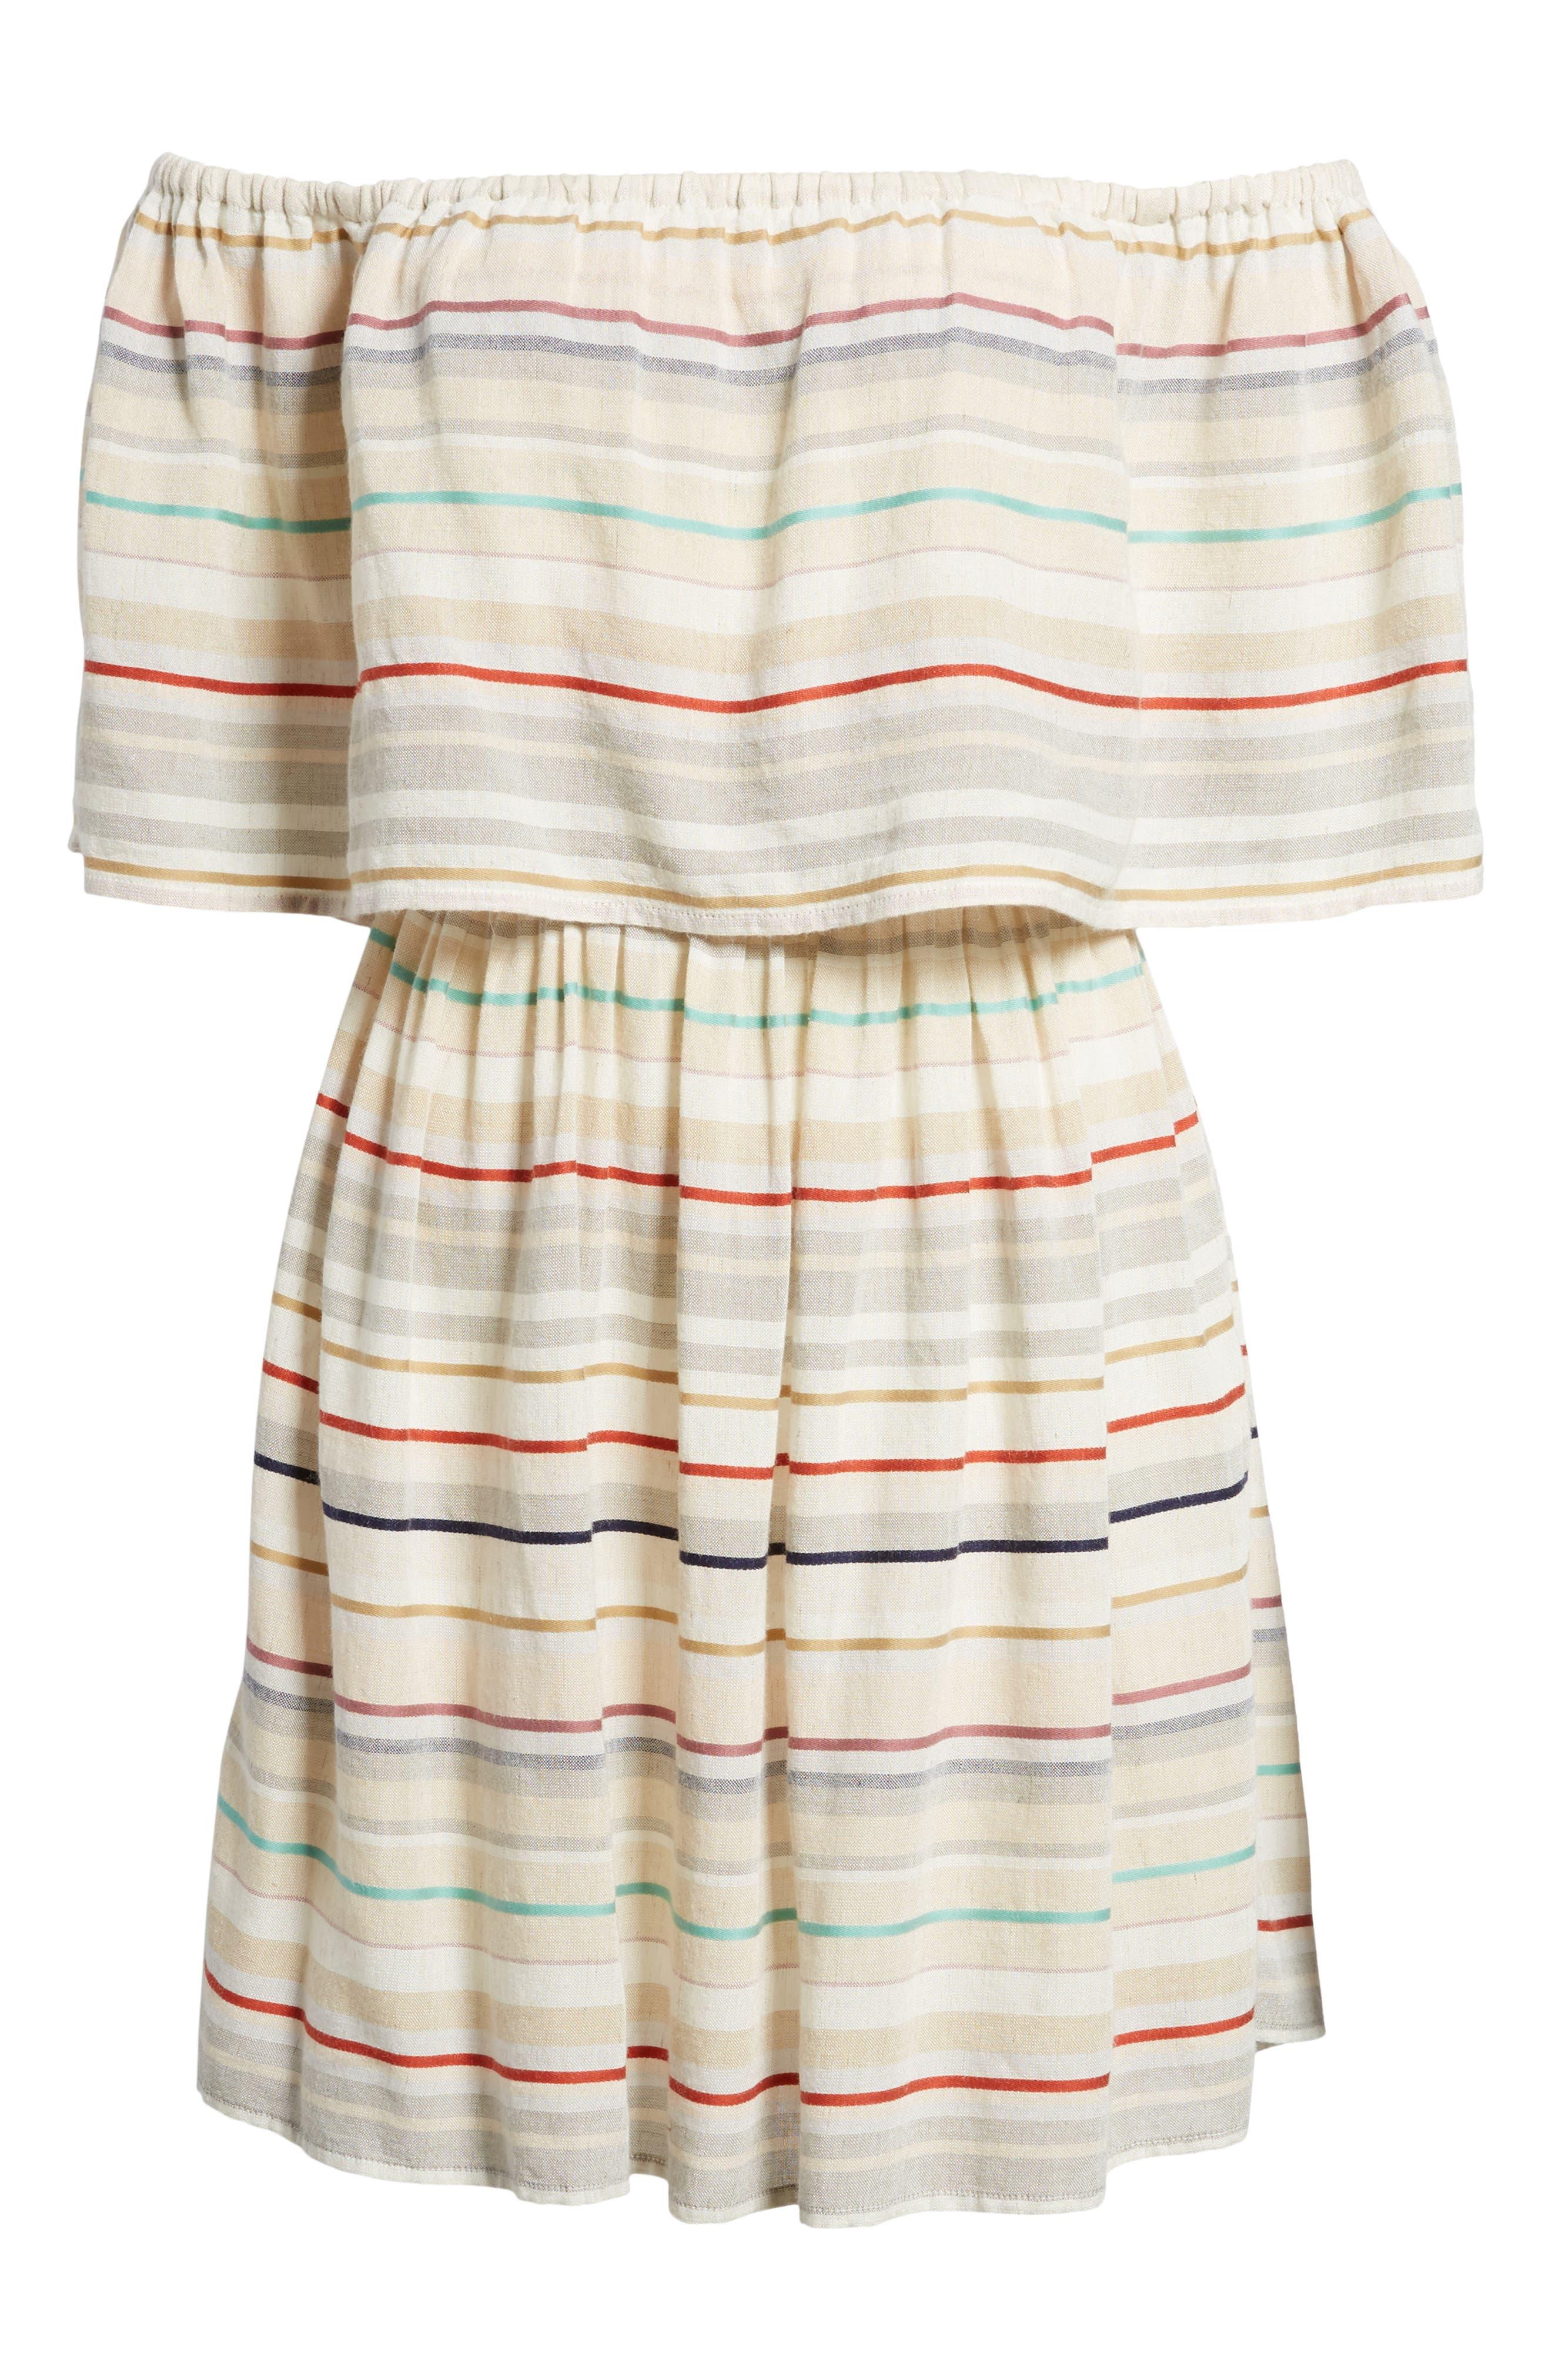 Stripe Off the Shoulder Dress,                             Alternate thumbnail 6, color,                             Beige Nougat Multi Stripe